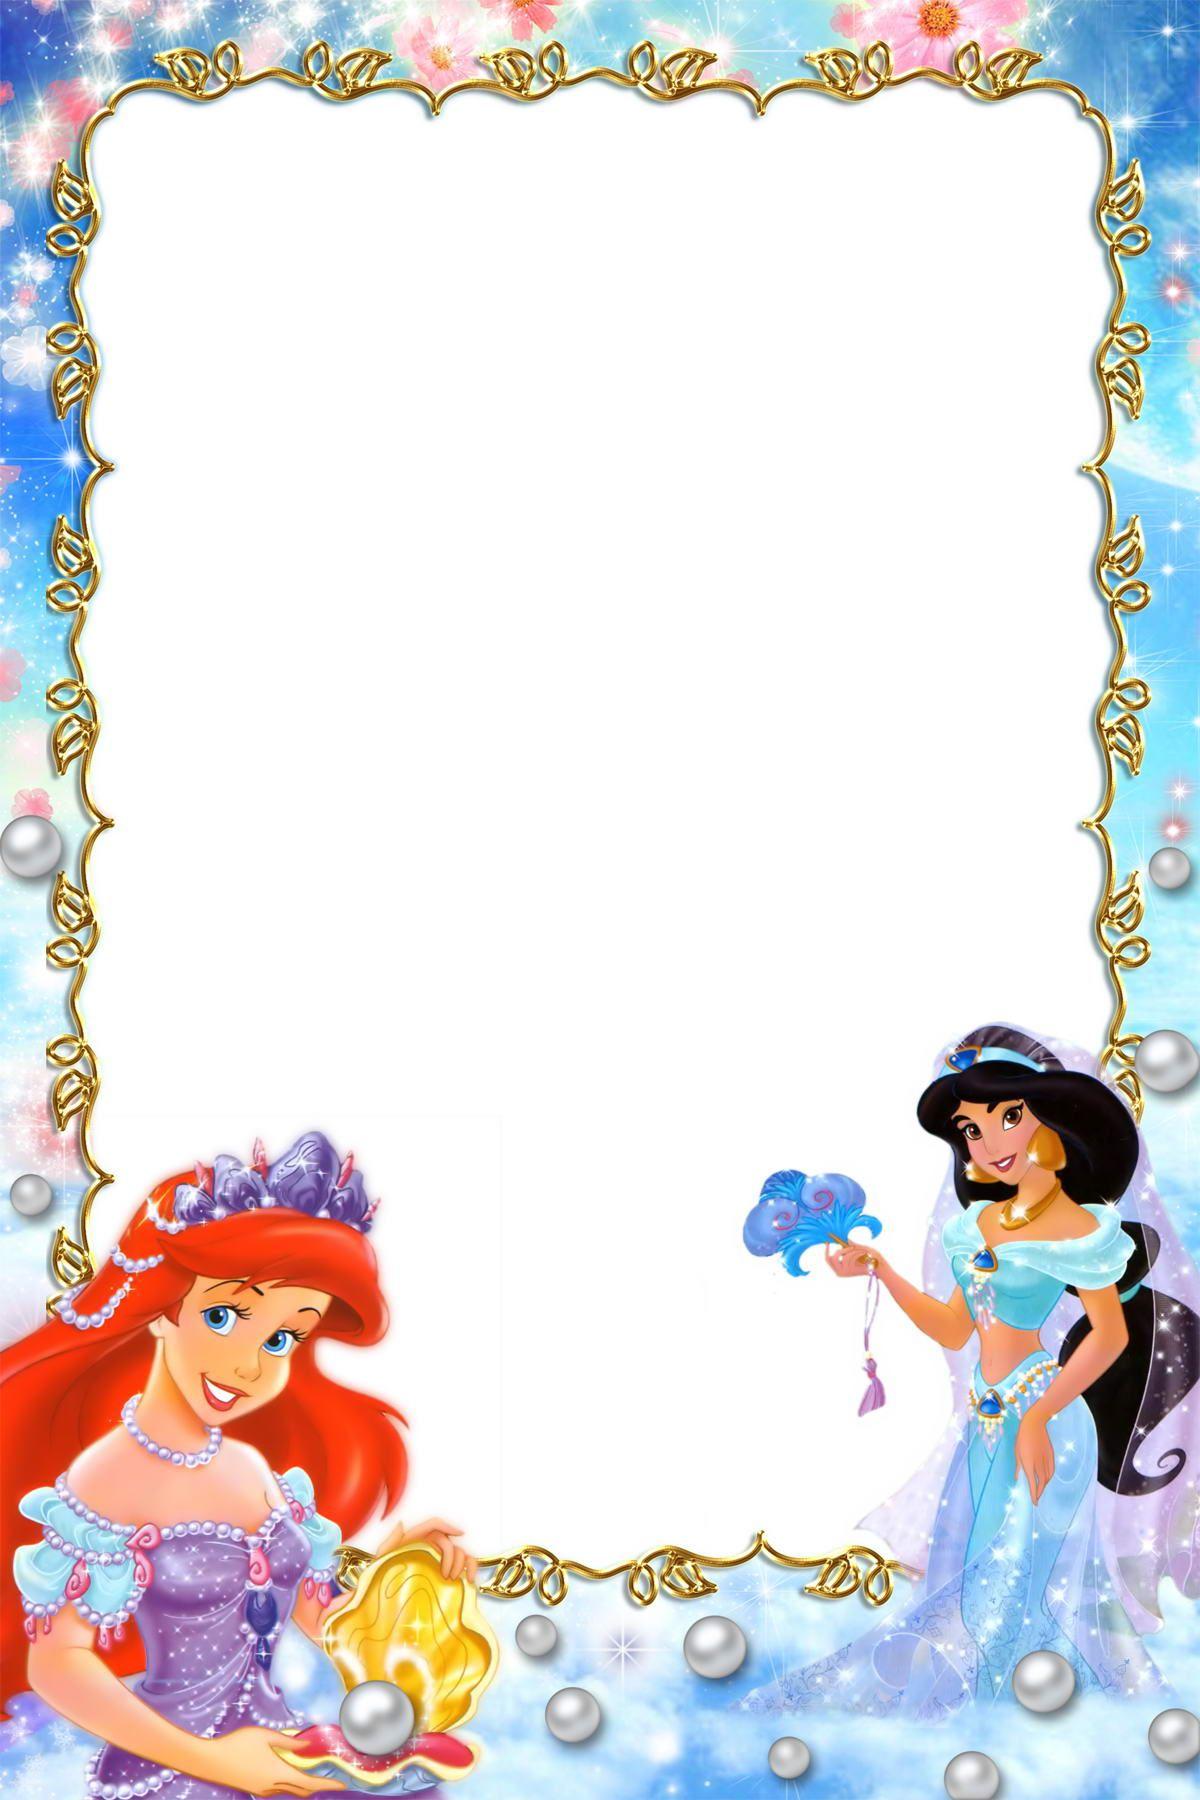 Princess border frames pictures | Clip art / borders | Pinterest ...